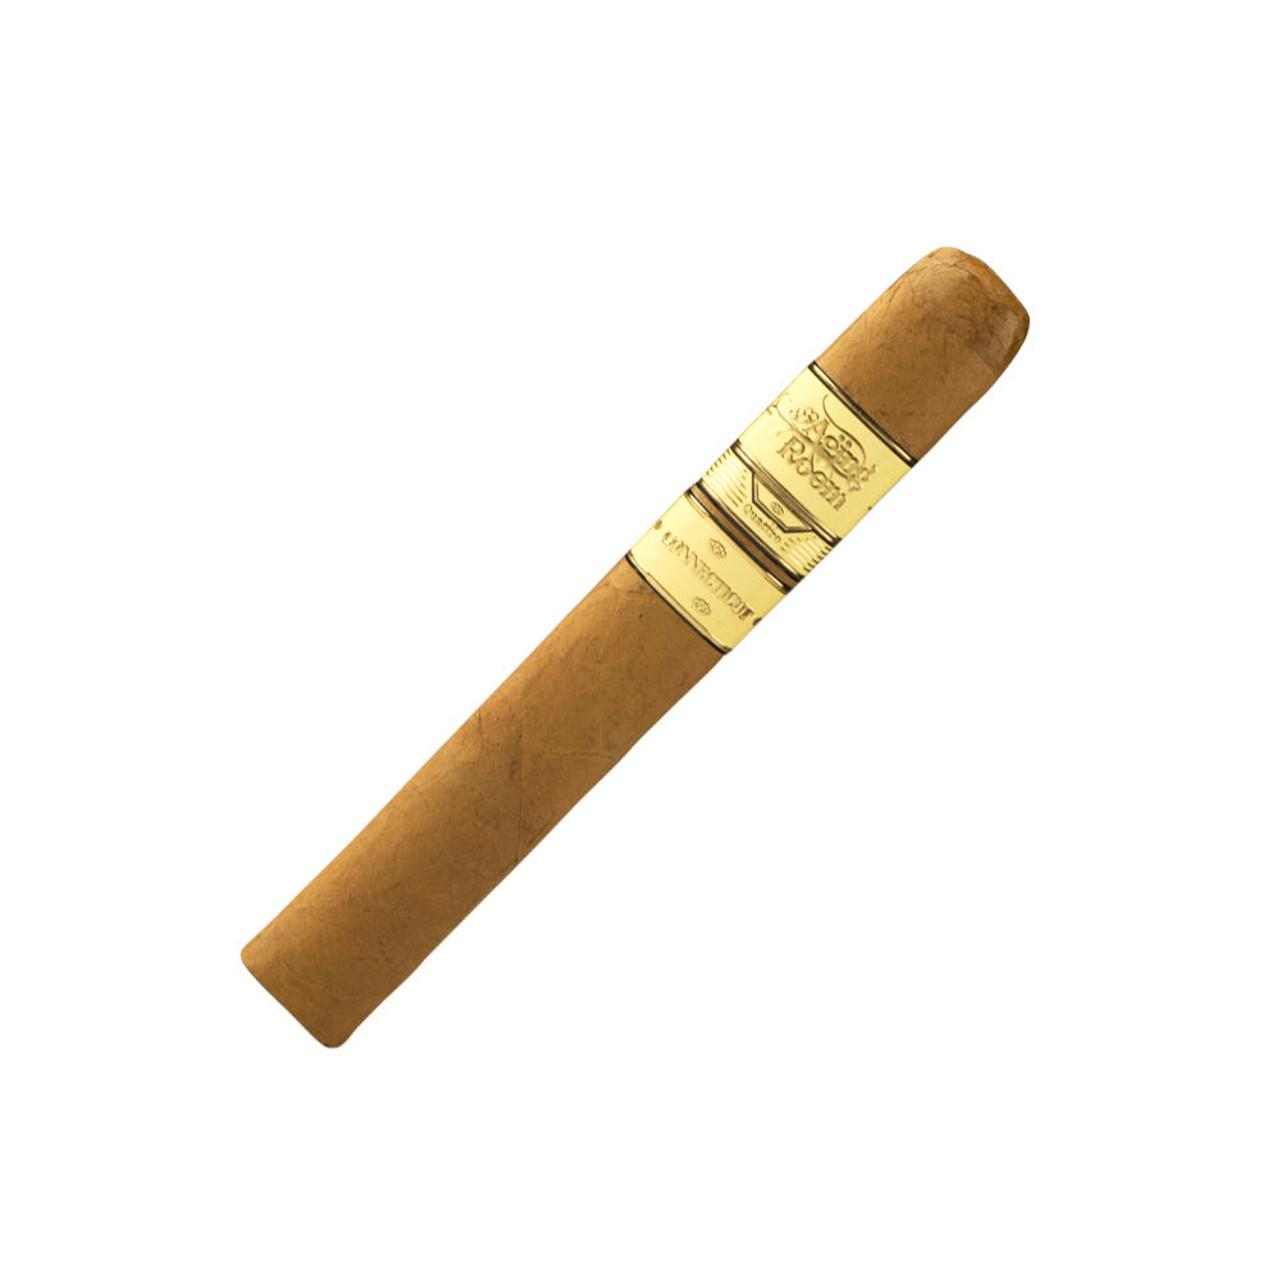 Aging Room Quattro Connecticut Connecticut Vibrato Cigars - 6 x 54 (Box of 20)